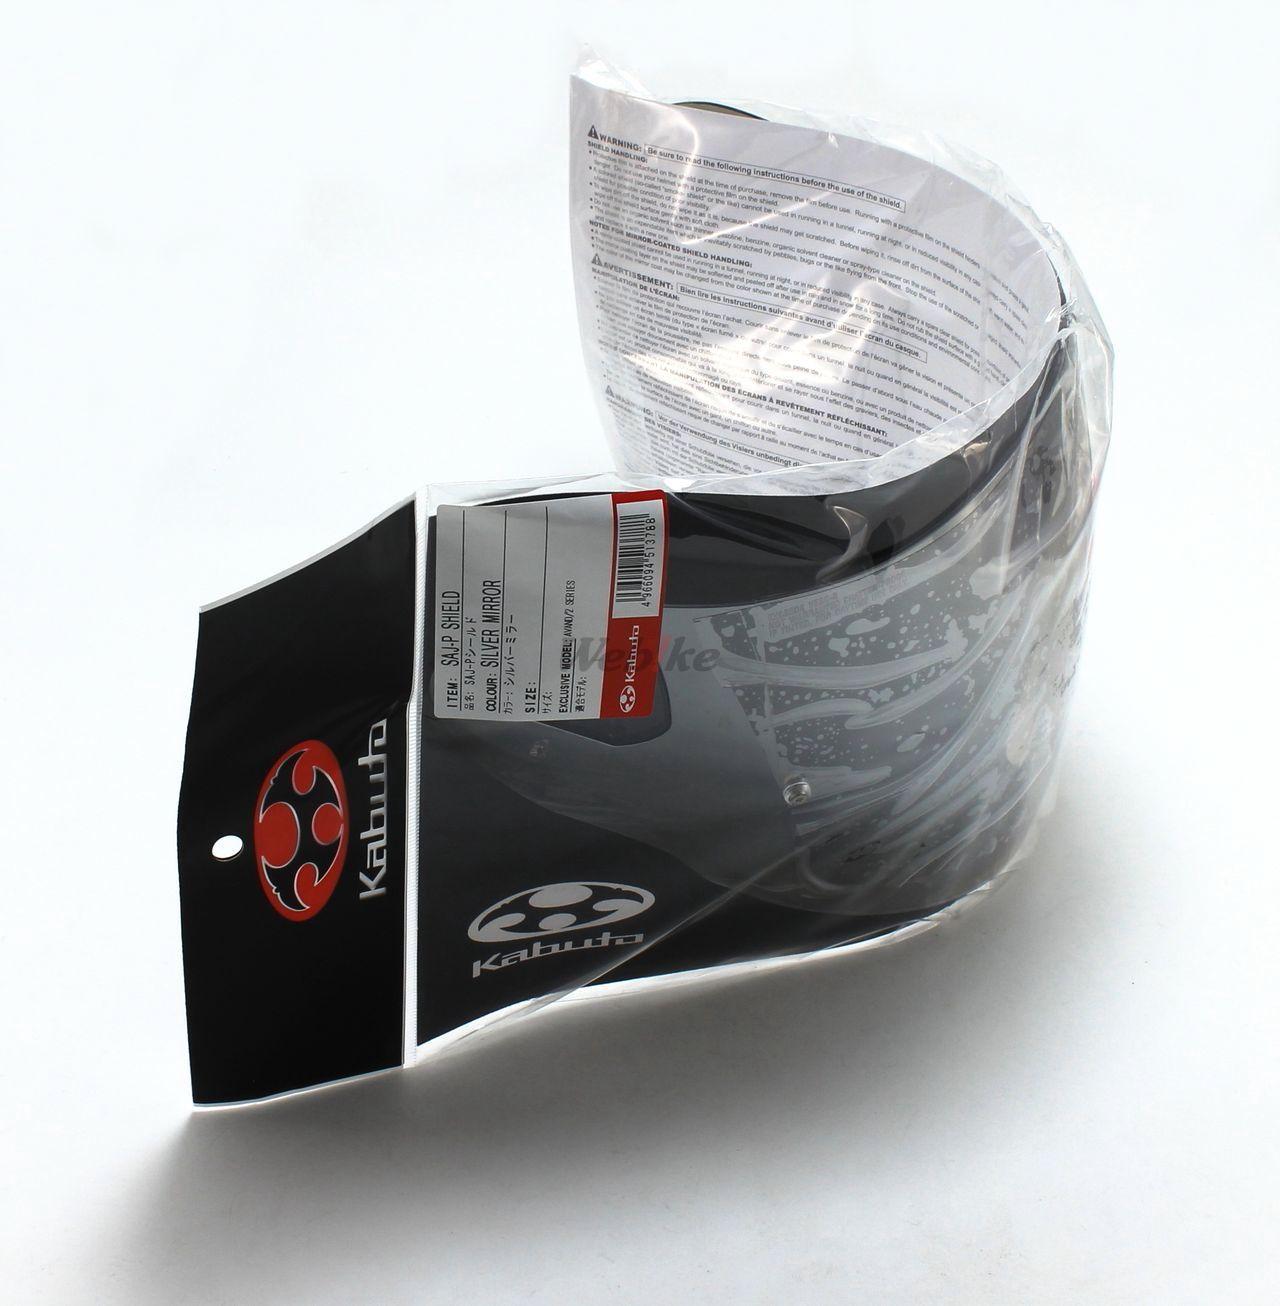 【OGK KABUTO】SAJ-P 鏡面安全帽鏡片 - 「Webike-摩托百貨」